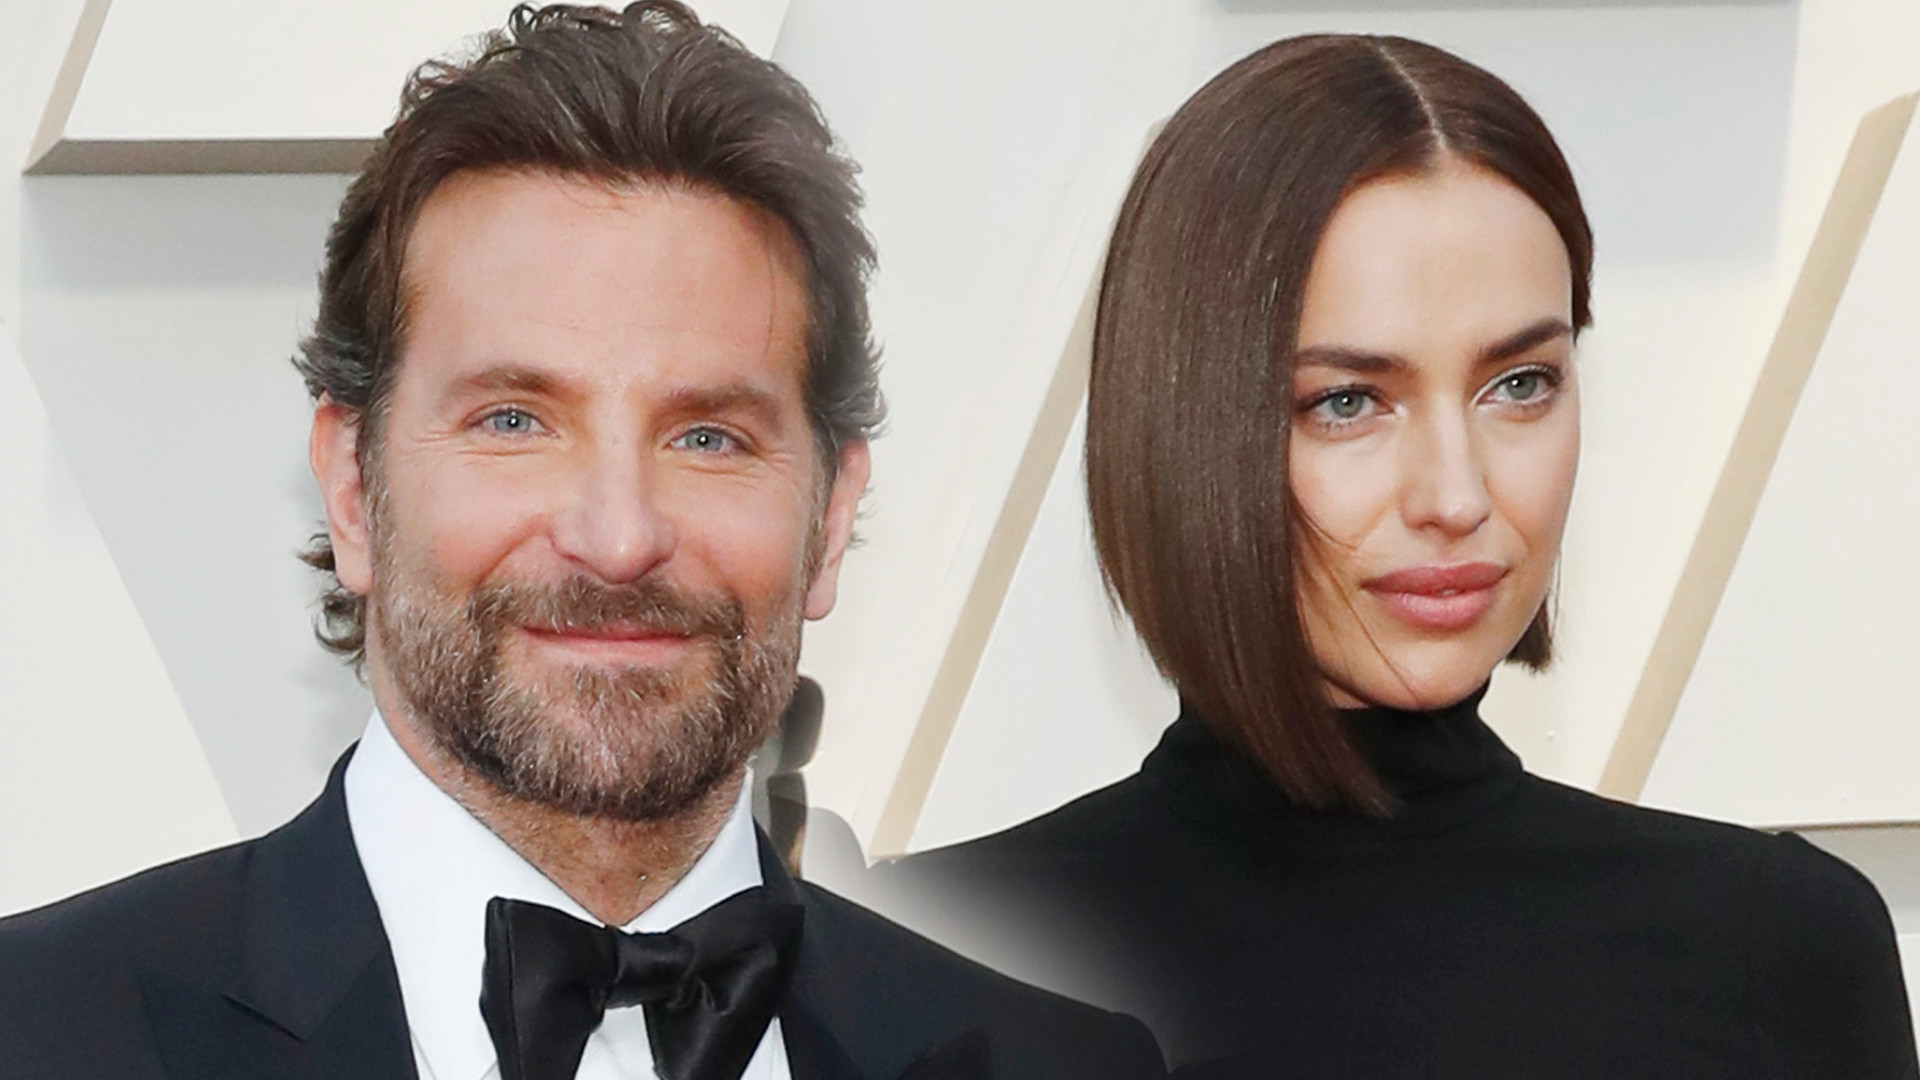 Bradley Cooper i Irina Shayk na Oscarach po plotkach o romansie aktora z Lady Gagą